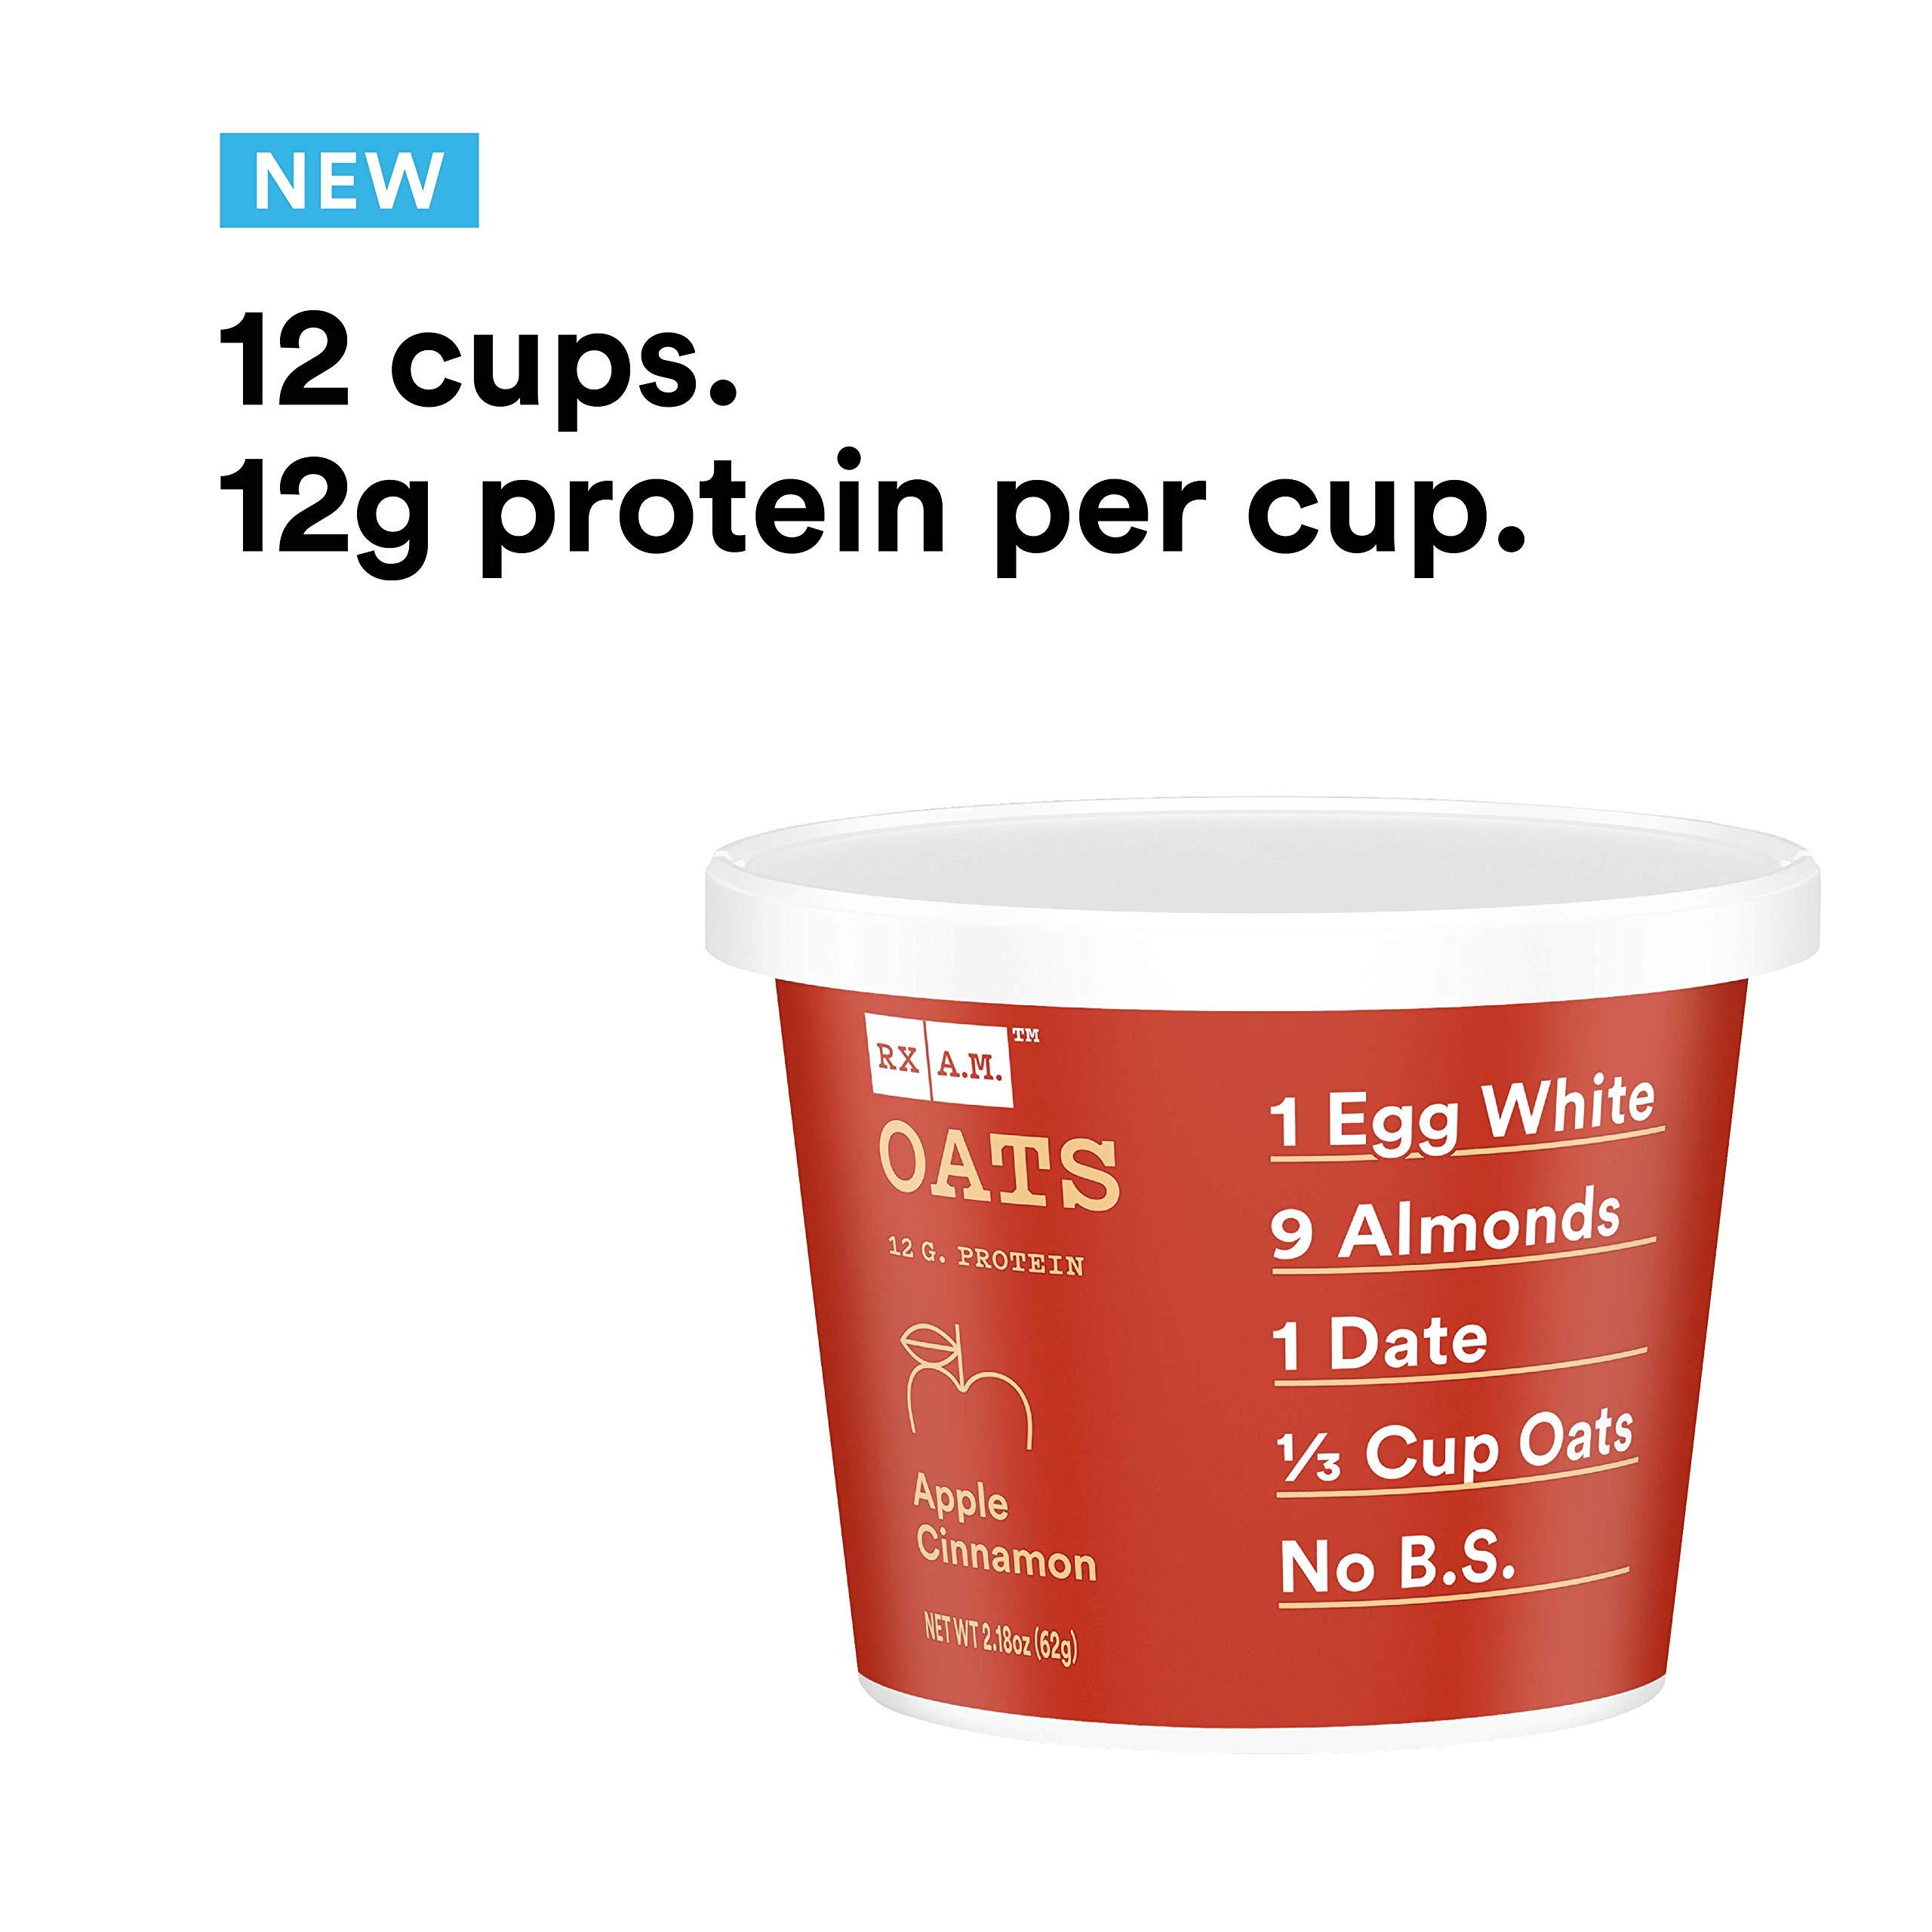 RXBAR, Rx A.M. Oats, Apple Cinnamon, 12ct, 2.24oz Cups, 12 Gluten Free Oatmeal Cups by RXBAR